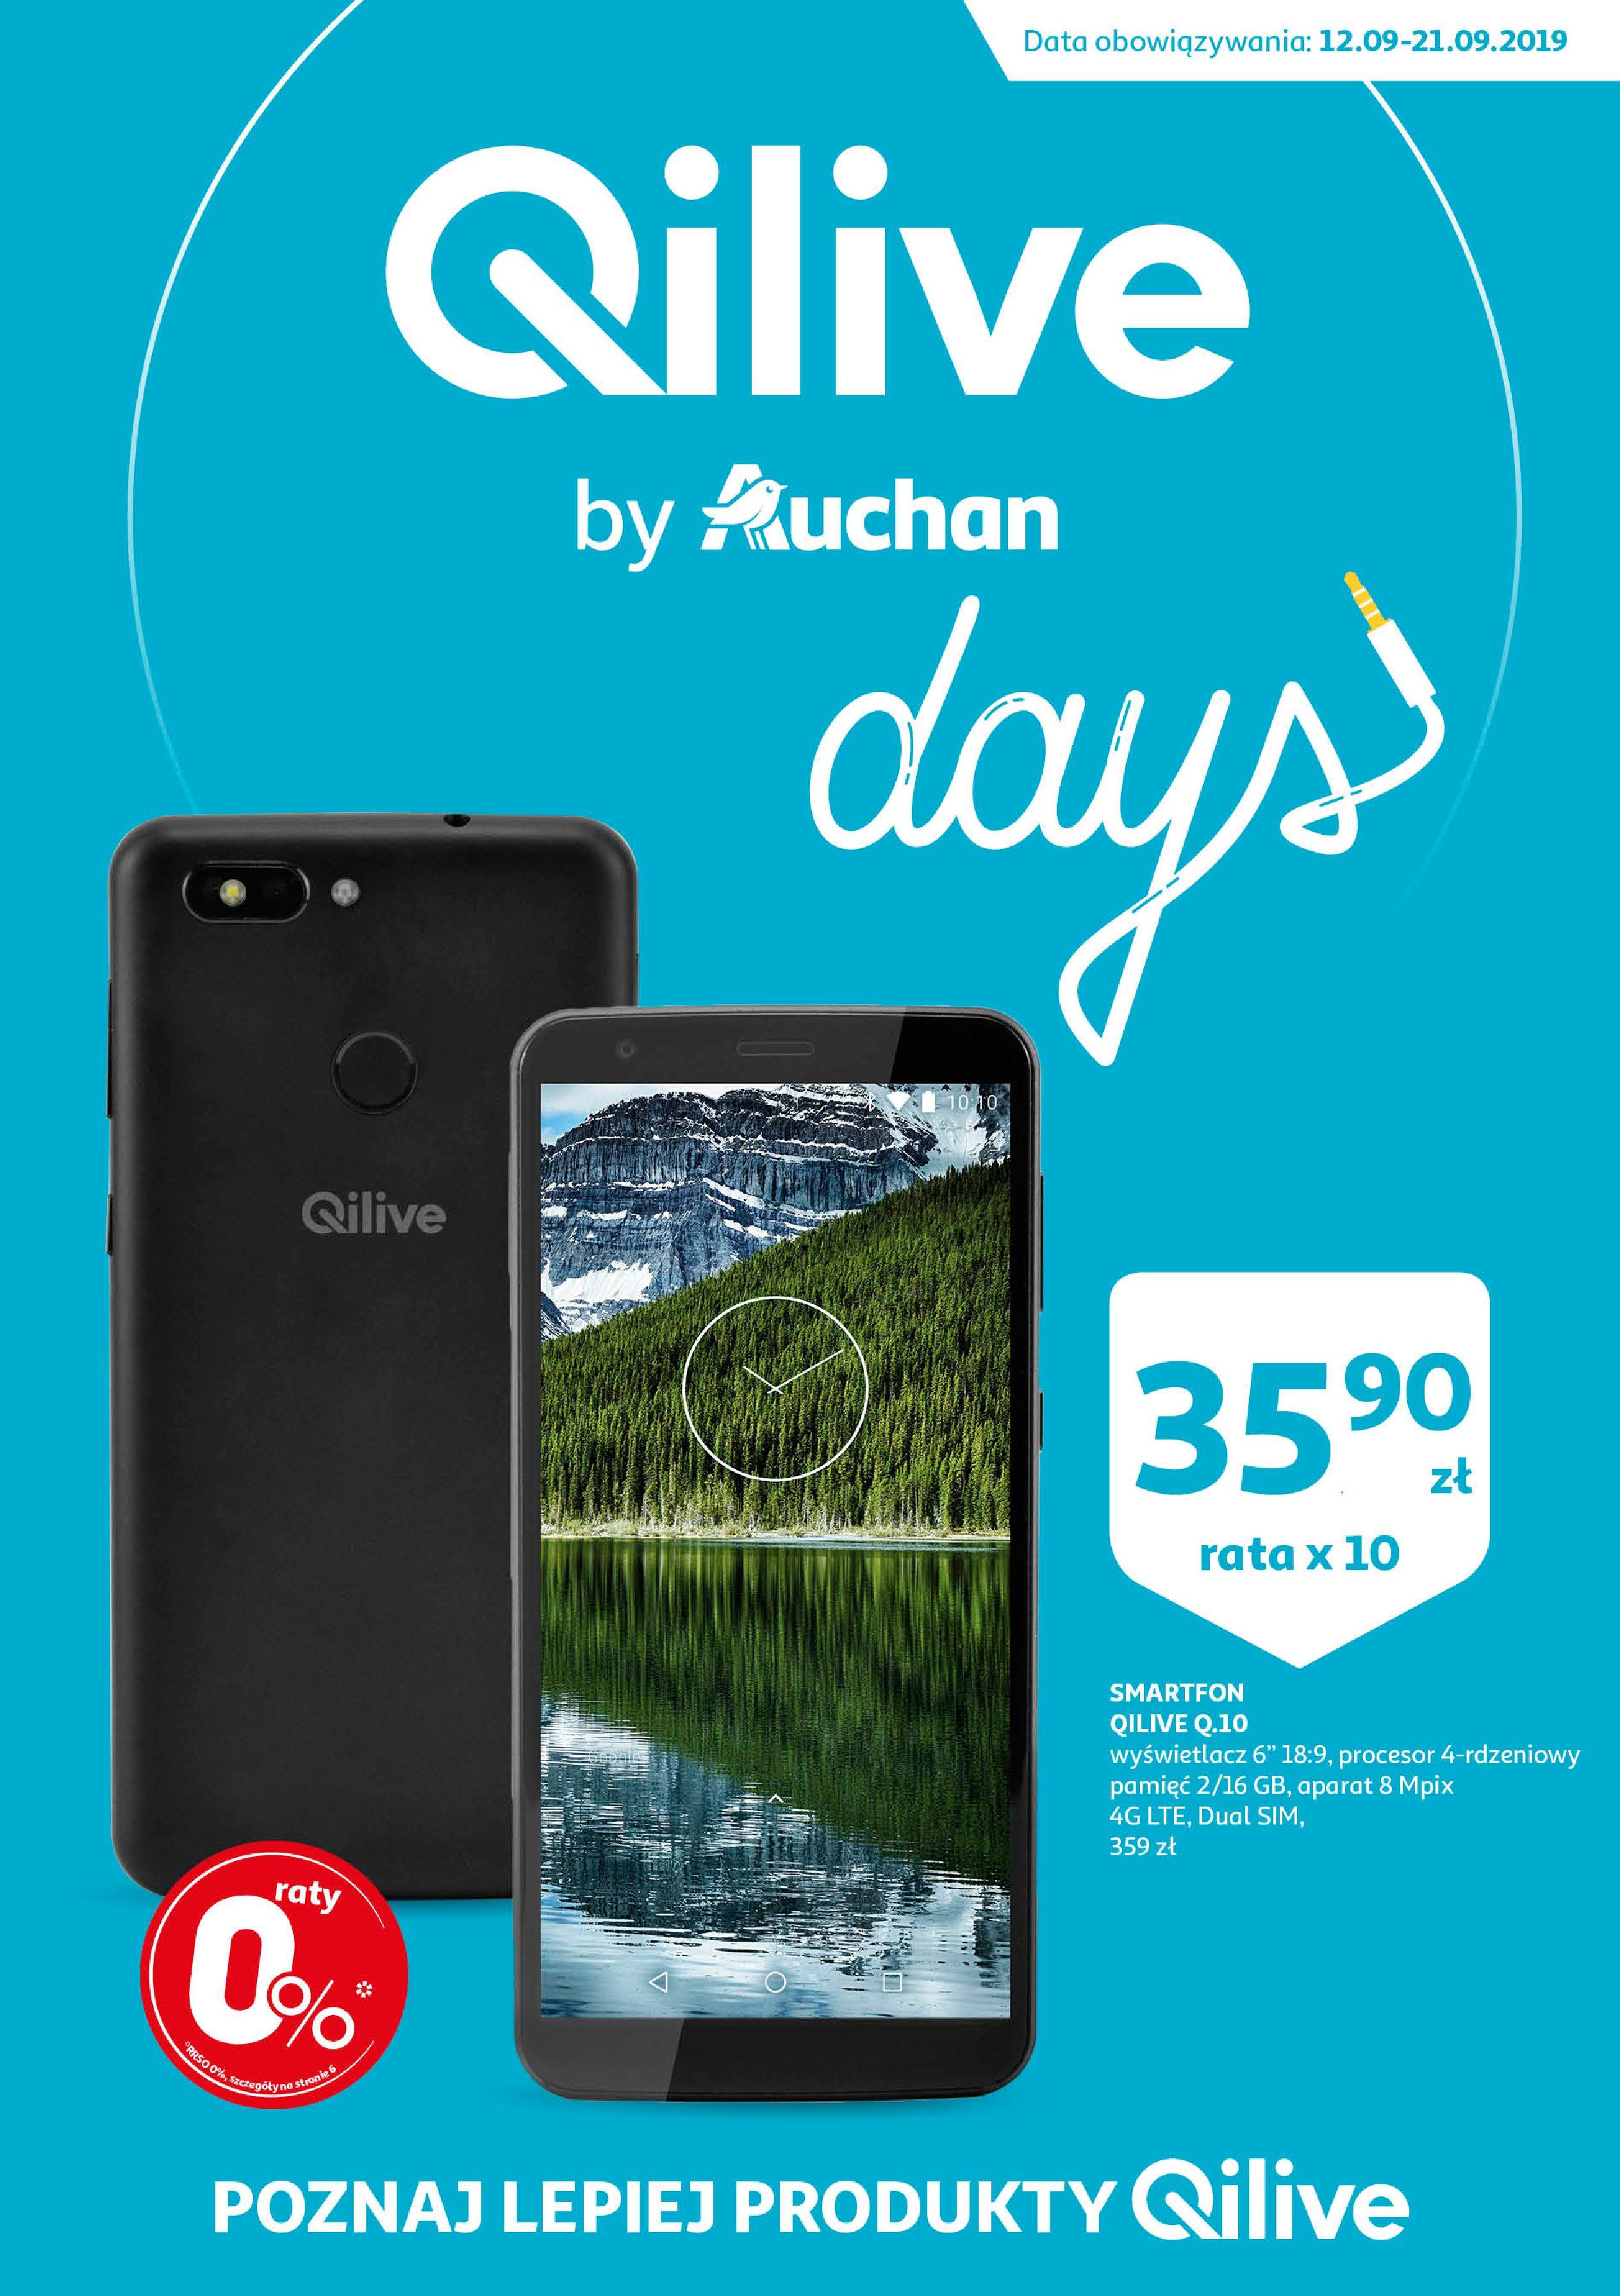 Gazetka Auchan - QILIVE byAuchan days  Hipermarkety-11.09.2019-21.09.2019-page-1